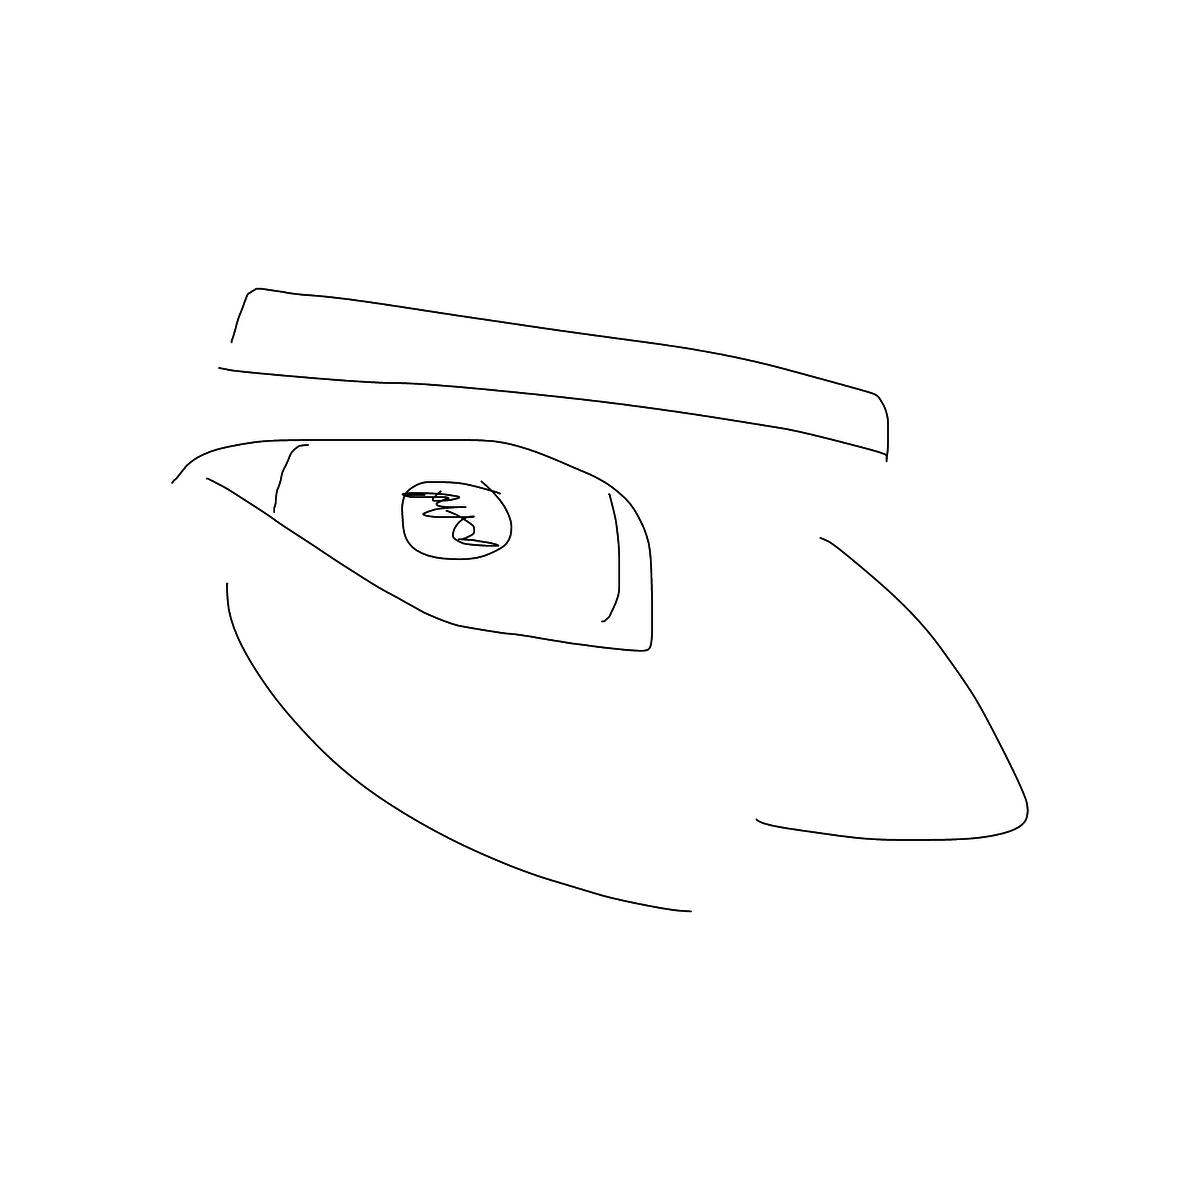 BAAAM drawing#3825 lat:33.5200309753418000lng: -112.0809097290039000